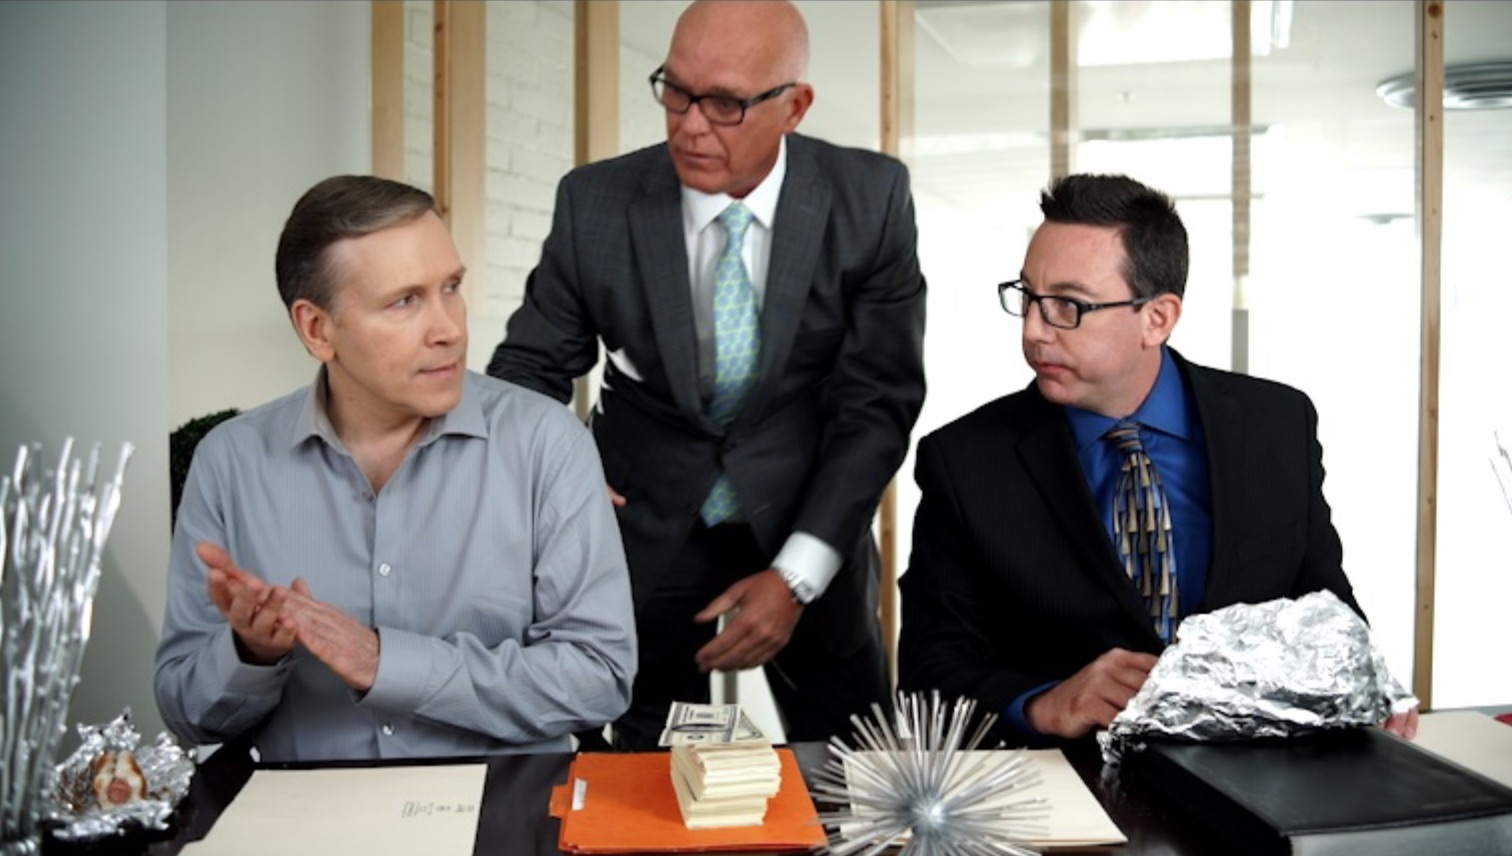 Dwight Turner as Alexander Sly, Wonnie Short as Wonnie, and Mike Breyer as Lucrative Street in Gradation